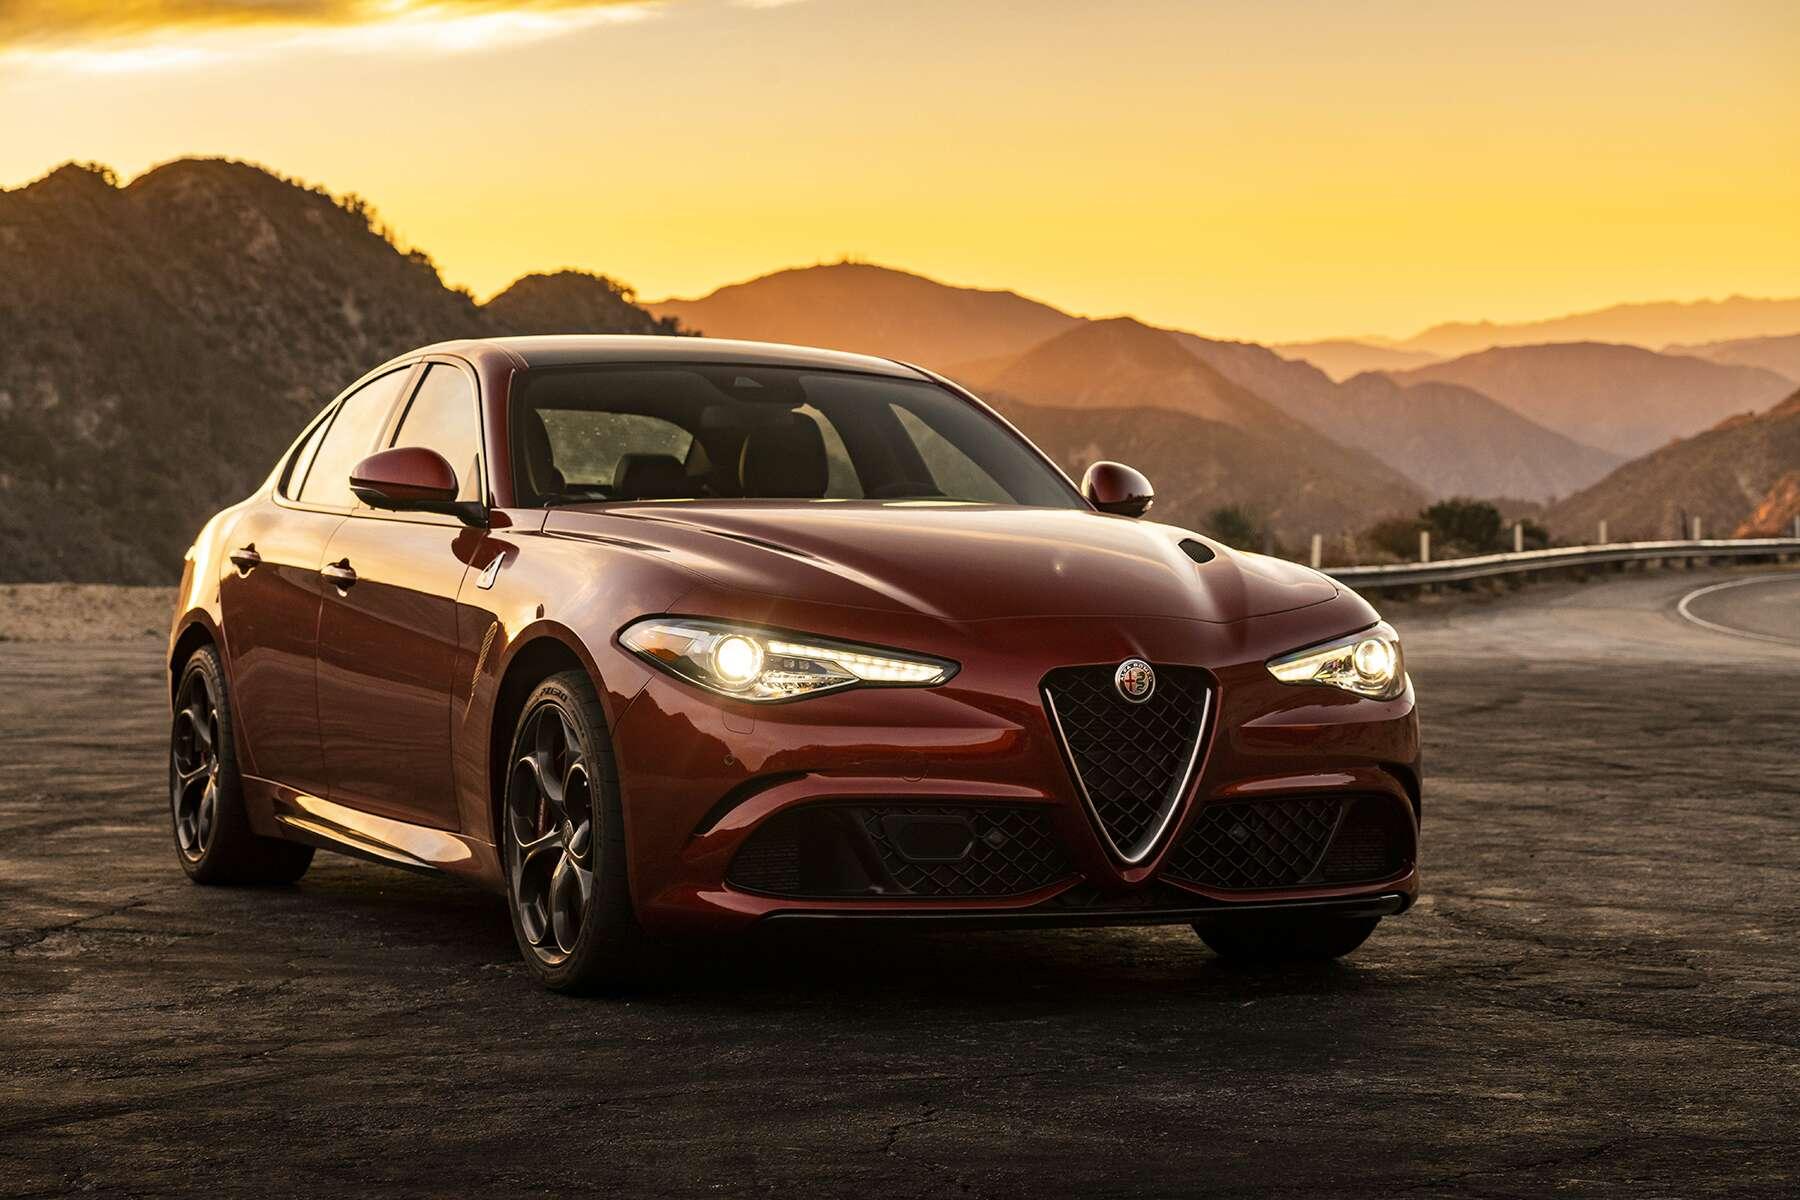 2018 Alfa Romeo Giulia Quadrifoglio Review Yes Virginia There Is